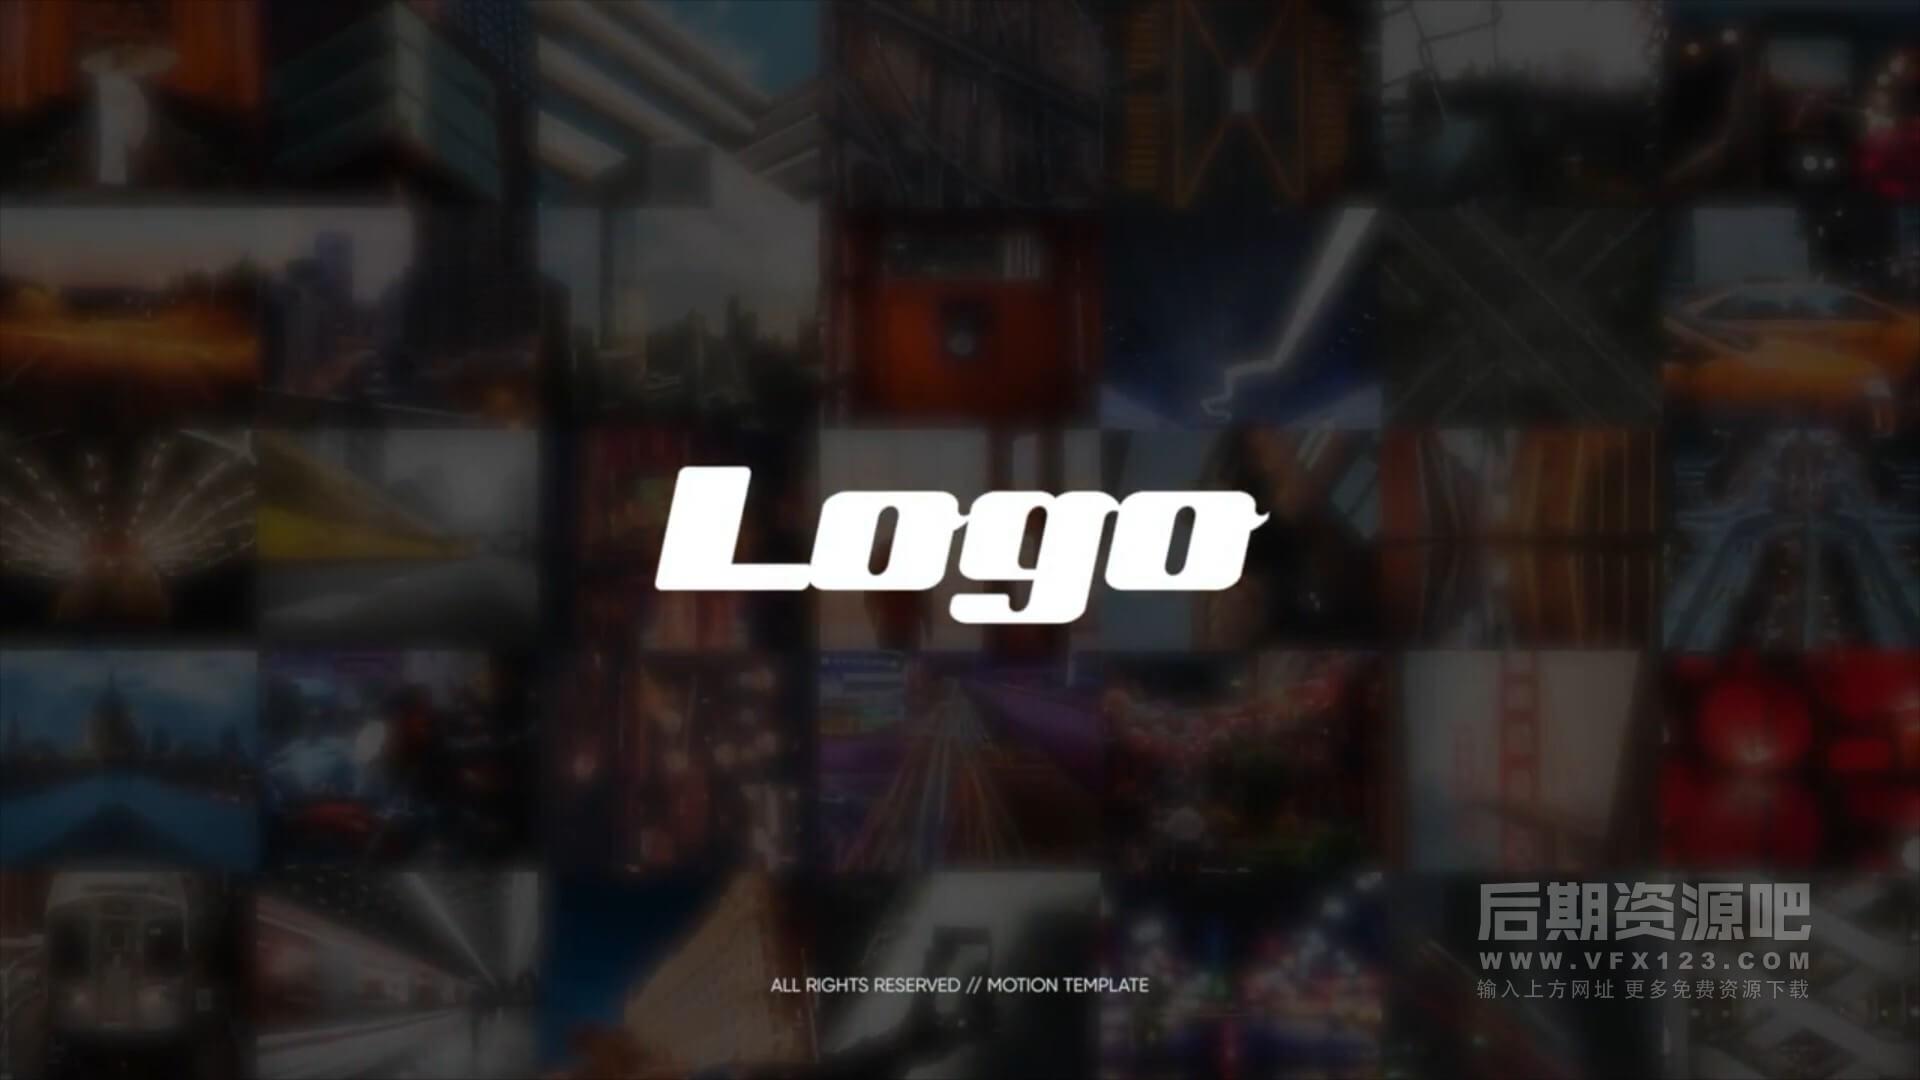 fcpx主题模板 照片墙多图闪现徽标LOGO展示片头 Logo Opener Photo Wall